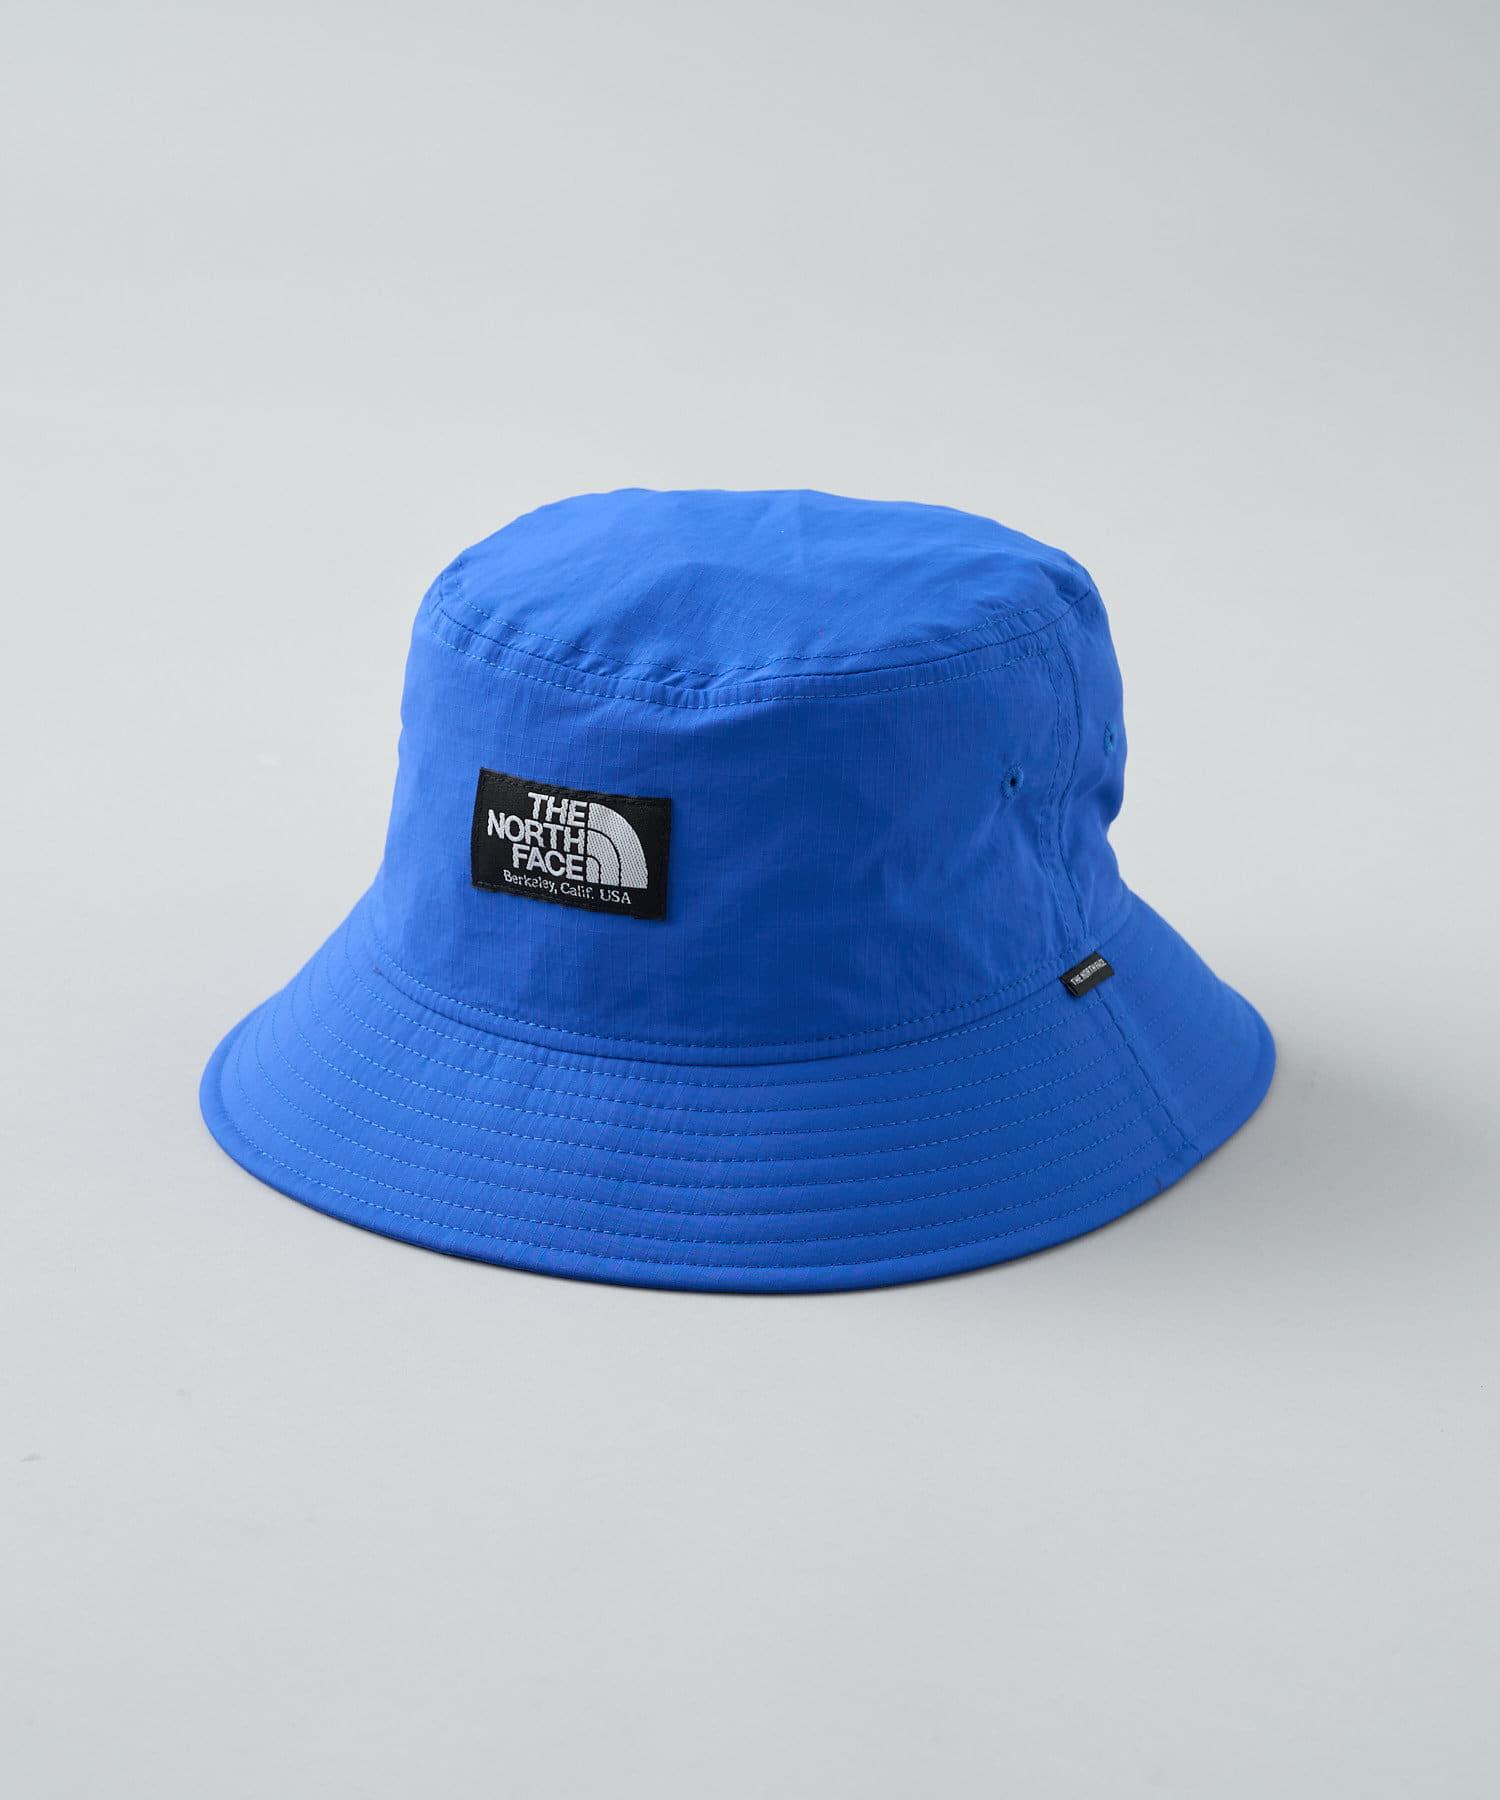 CIAOPANIC(チャオパニック) レディース 【THE NORTH FACE】Camp Side Hat/NN41906 ブルー